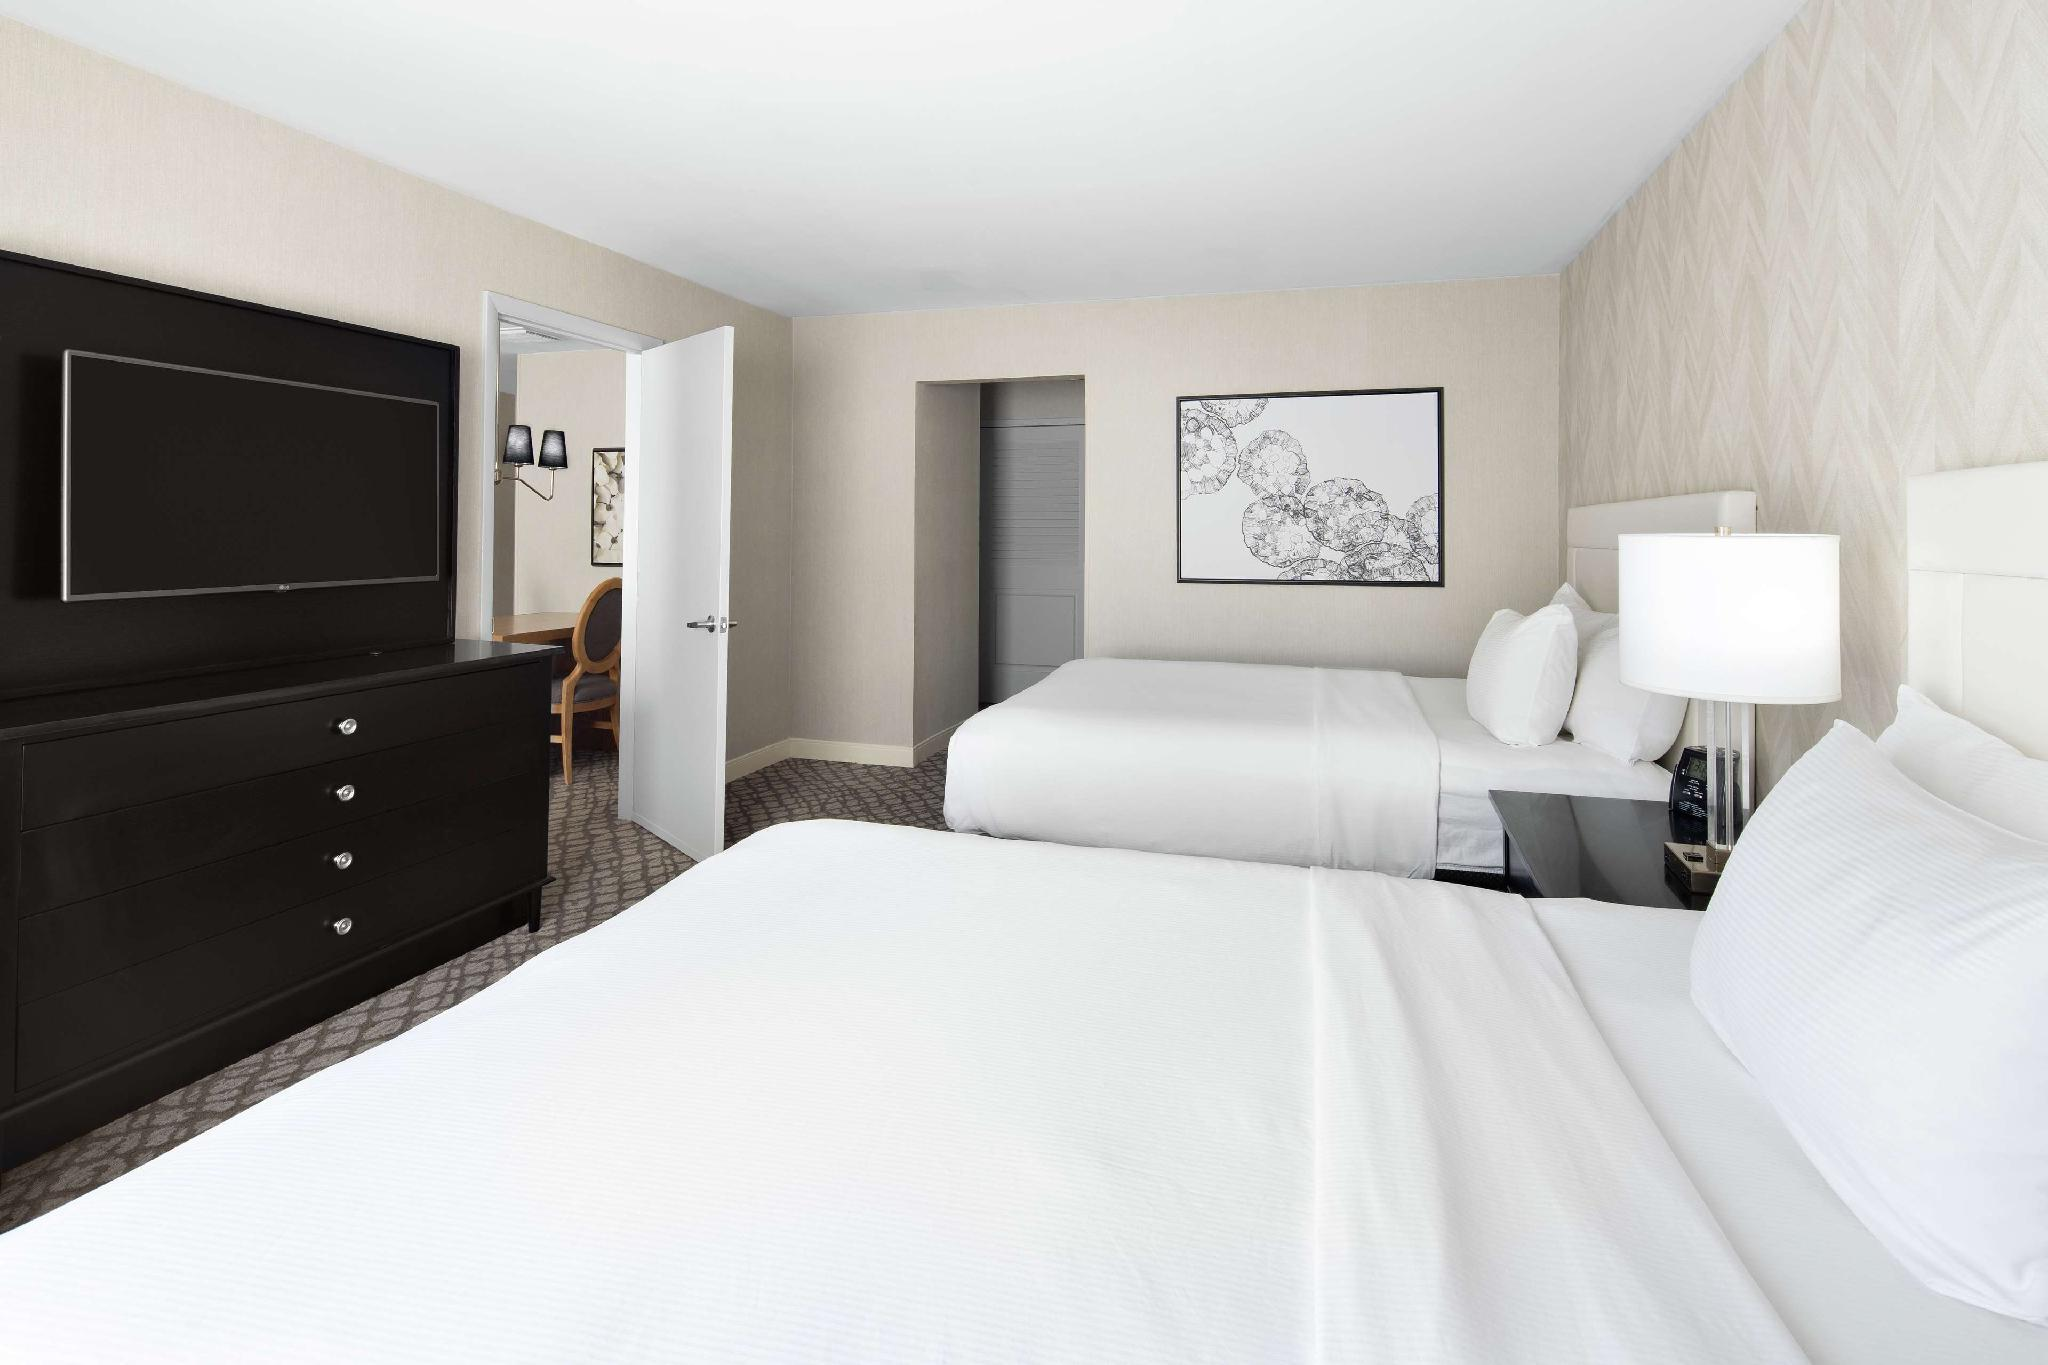 Picture of: Doubletree Suites By Hilton Charlotte Southpark Hotel Charlotte Nc Deals Photos Reviews